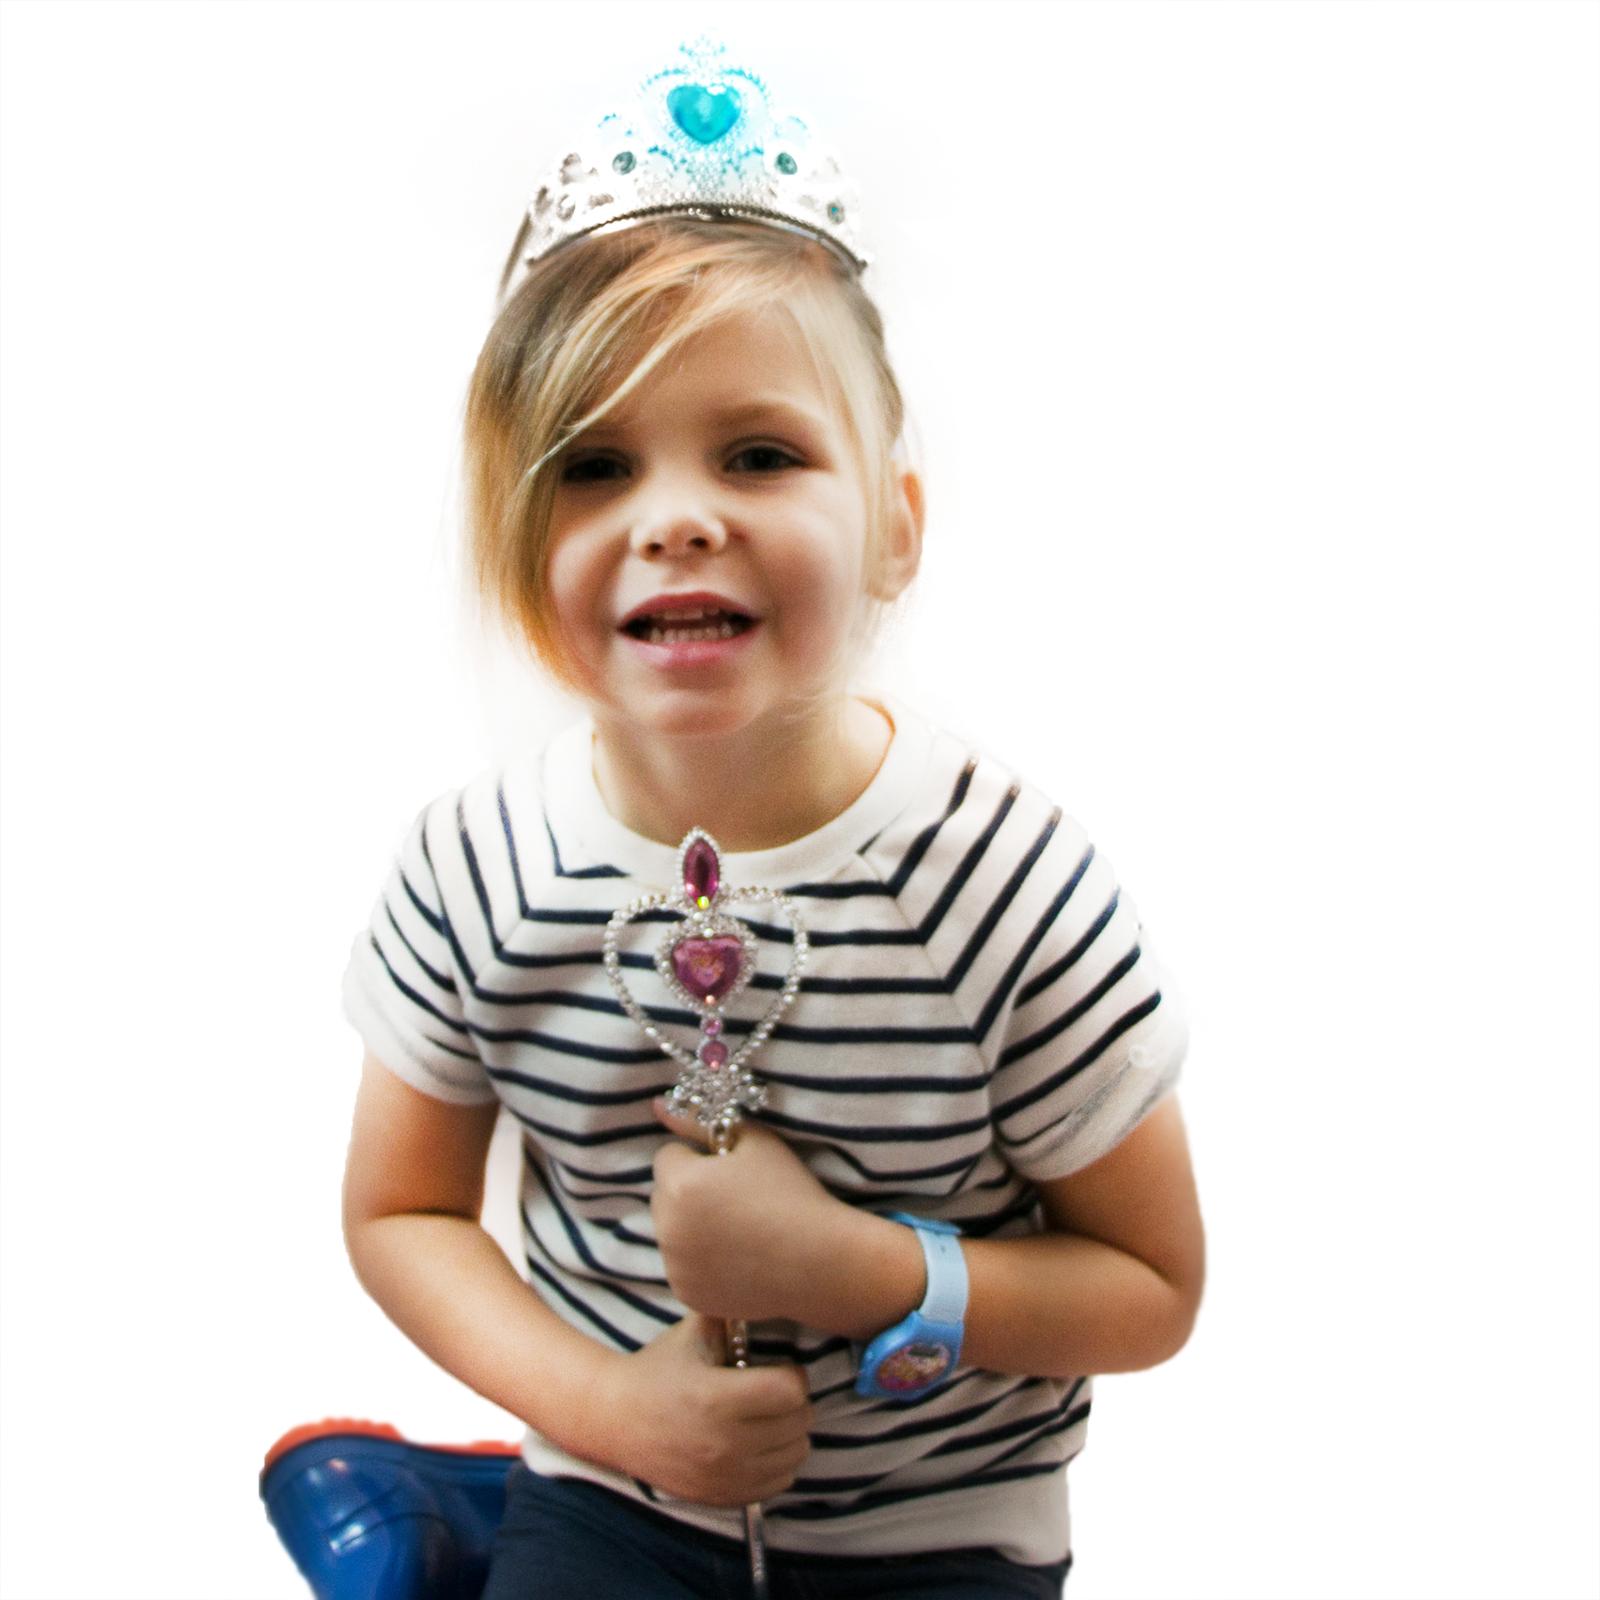 Disney Minnie Mouse Bowtique Girls 12.5 Inch Sparkle Wand Pretend Play Dress Up